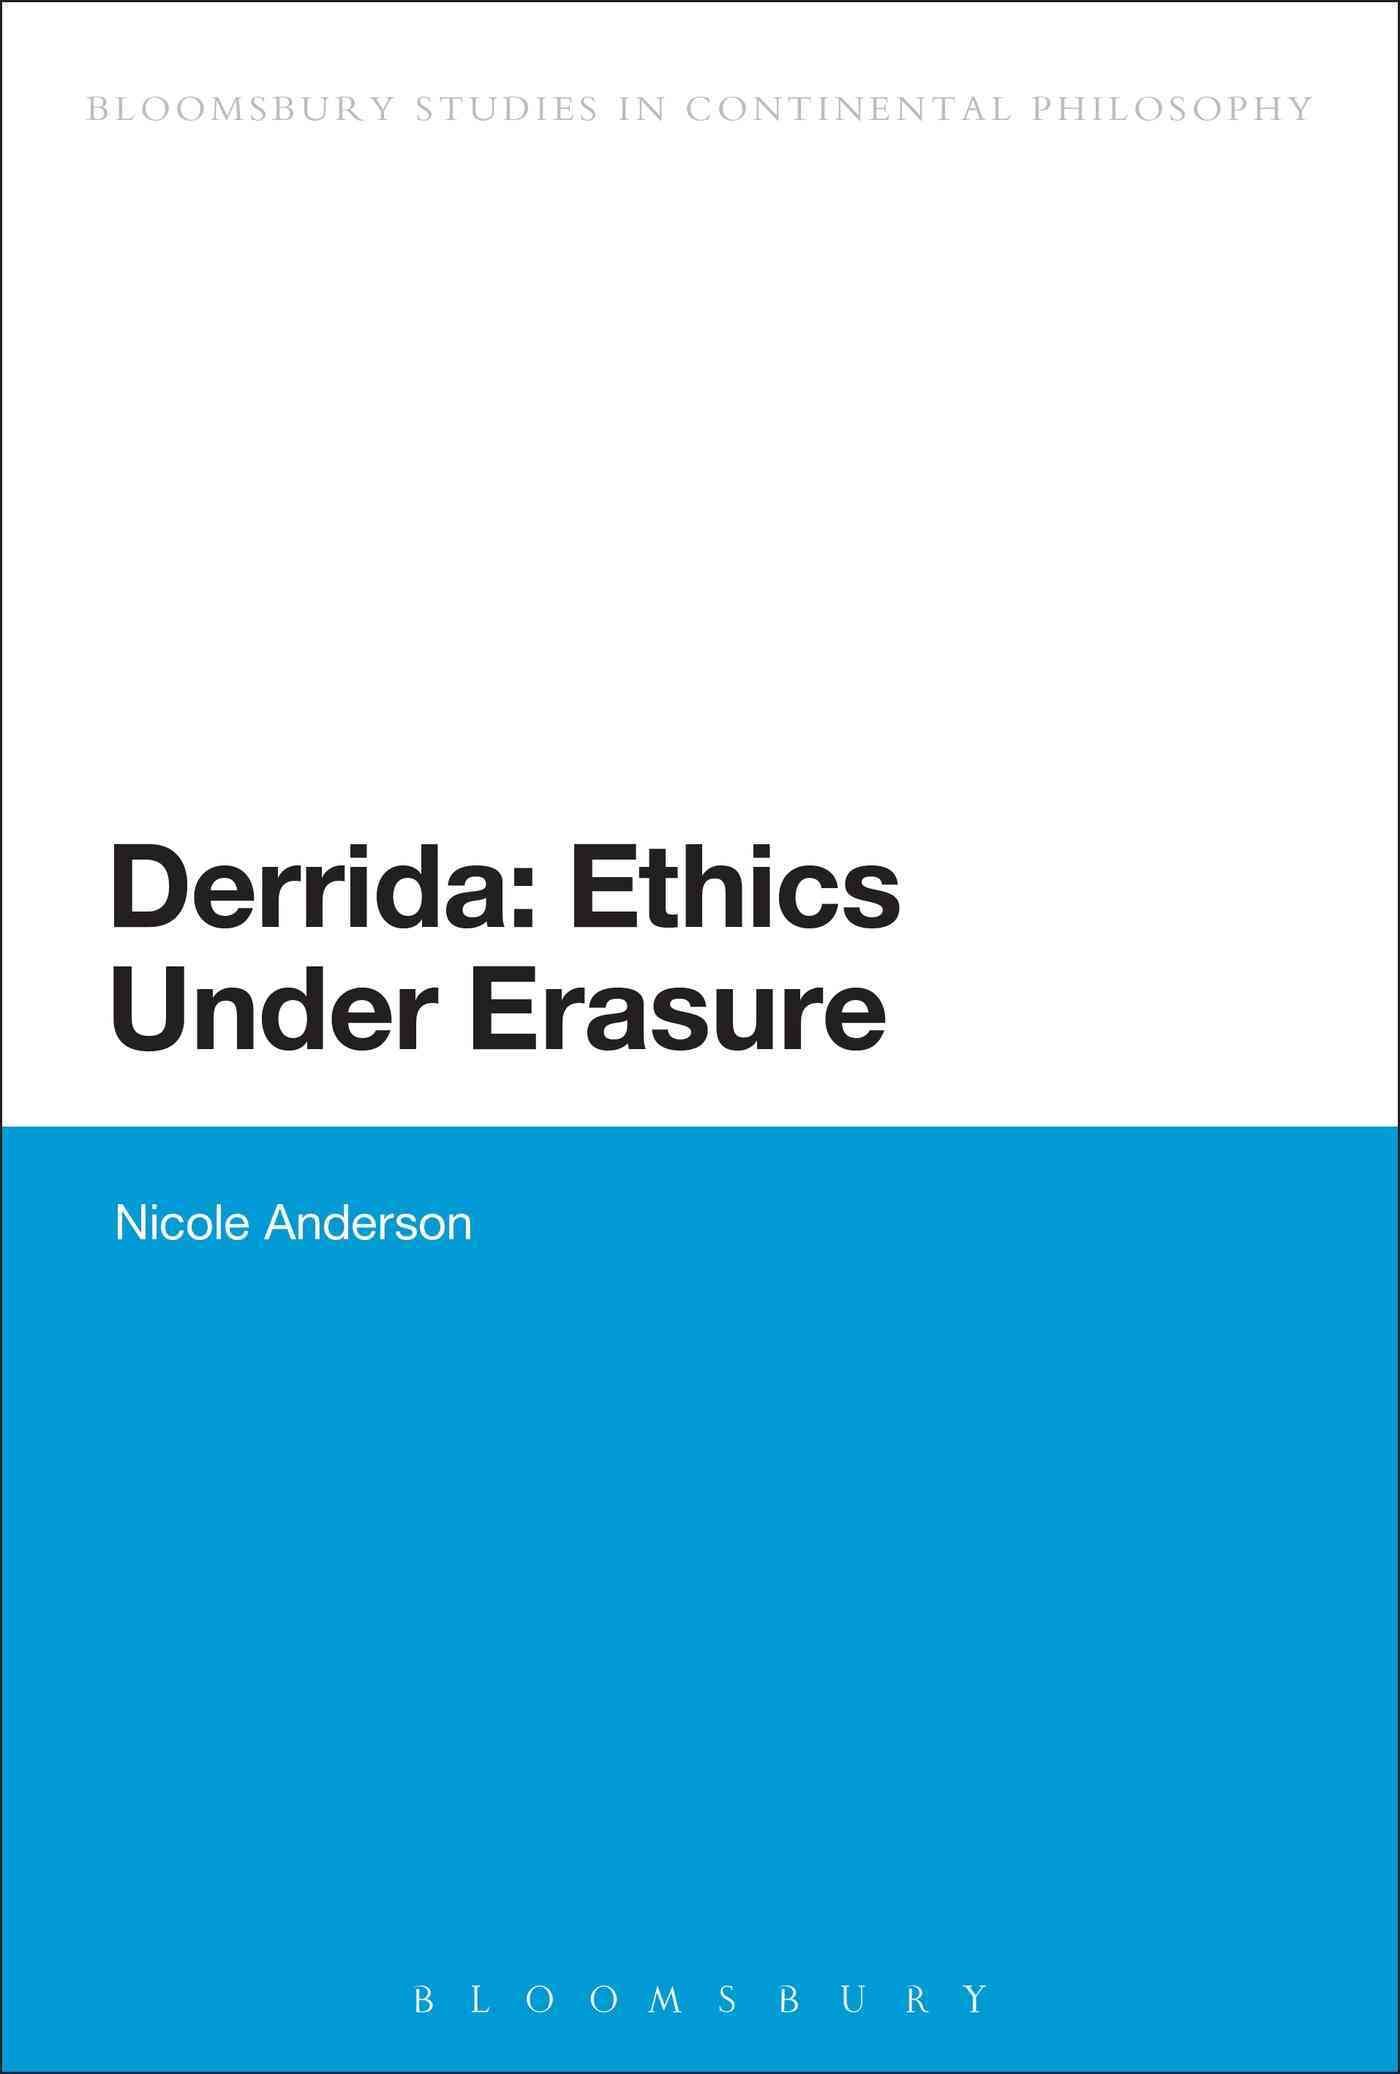 Derrida: Ethics Under Erasure